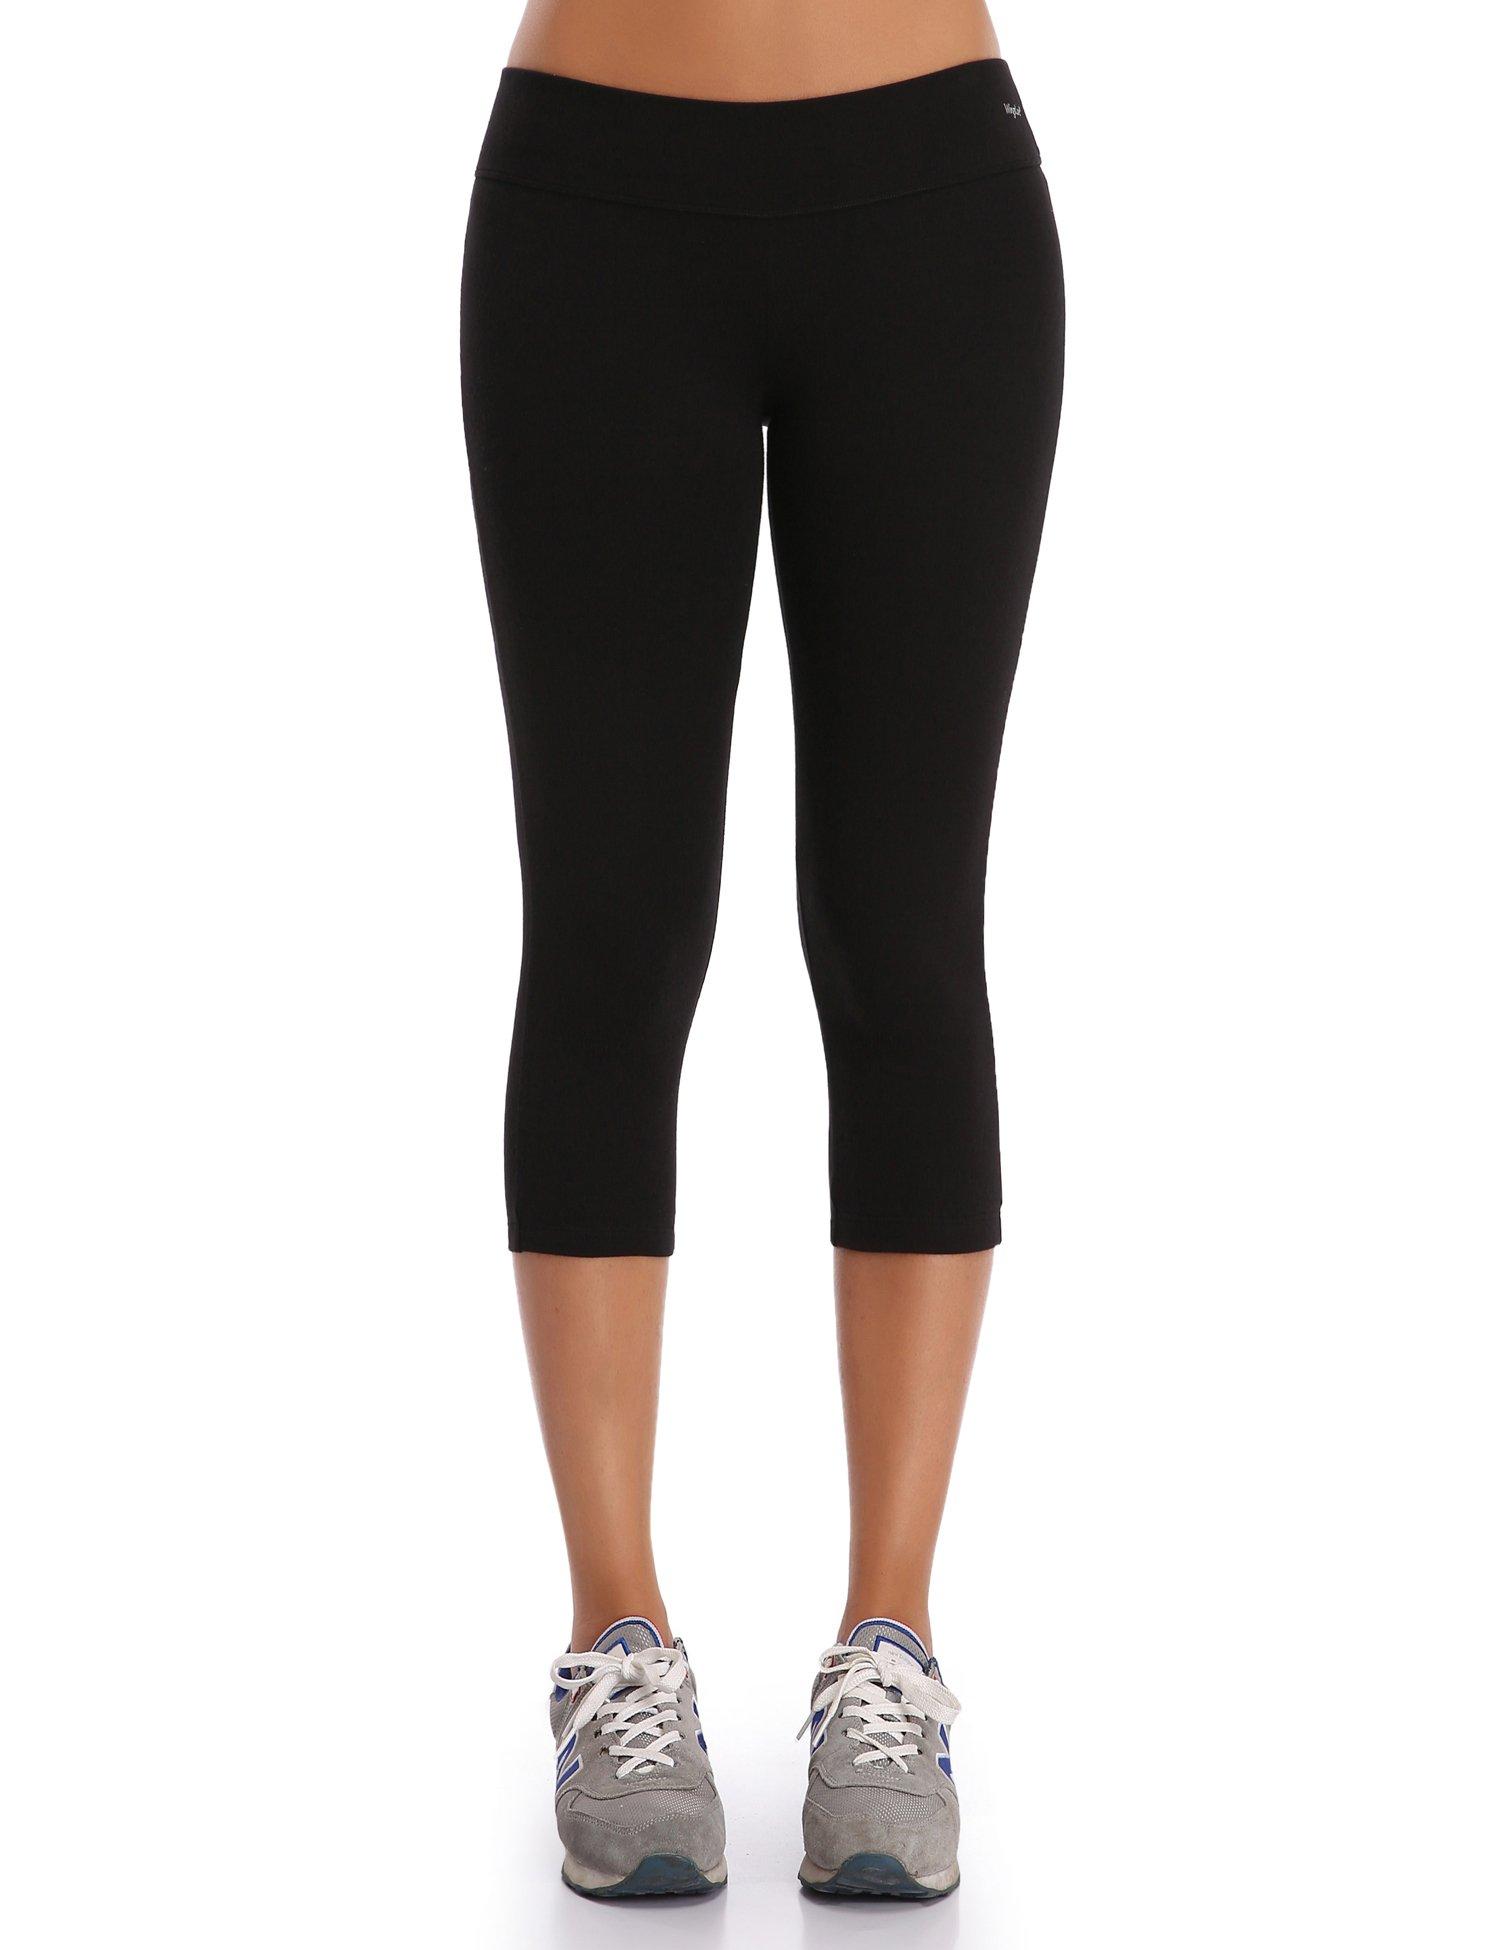 61 GmHTRh6L - WingsLove Women's Yoga Workout Capri Pants Sports Running Tights Leggings